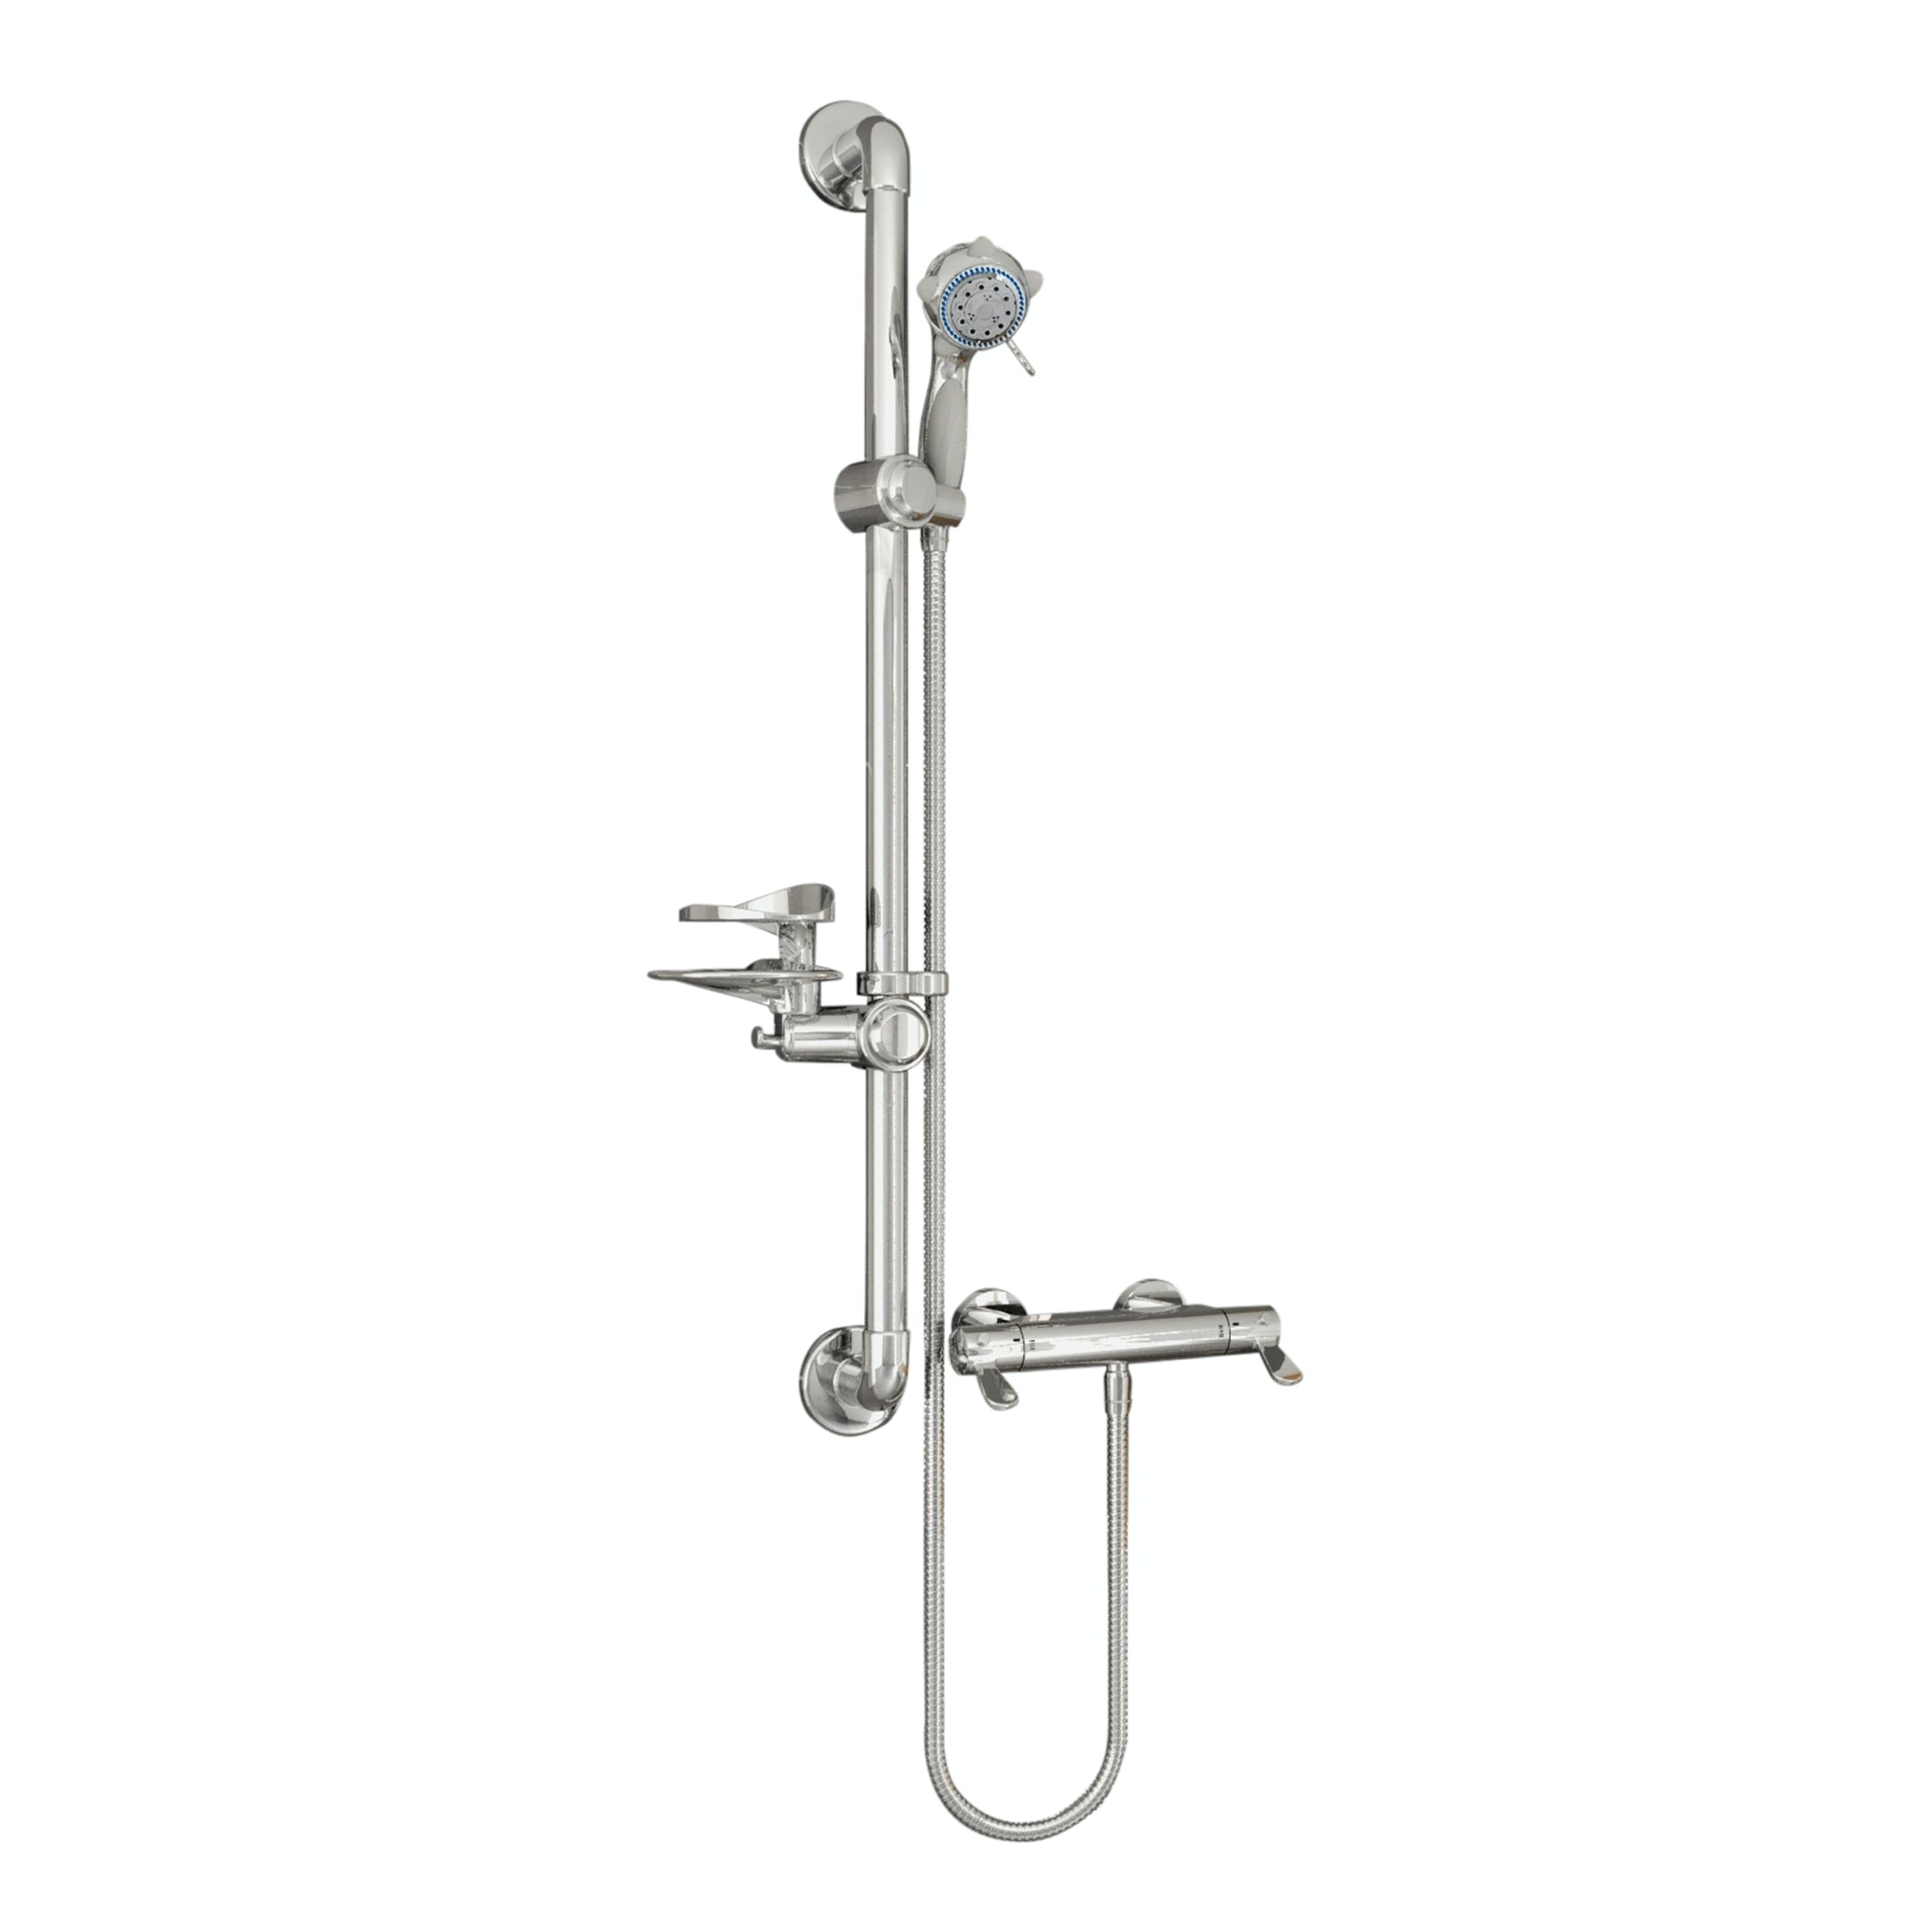 arm twin head mode bathroom mixer rain taps switch handheld bar itm button shower set spray rail